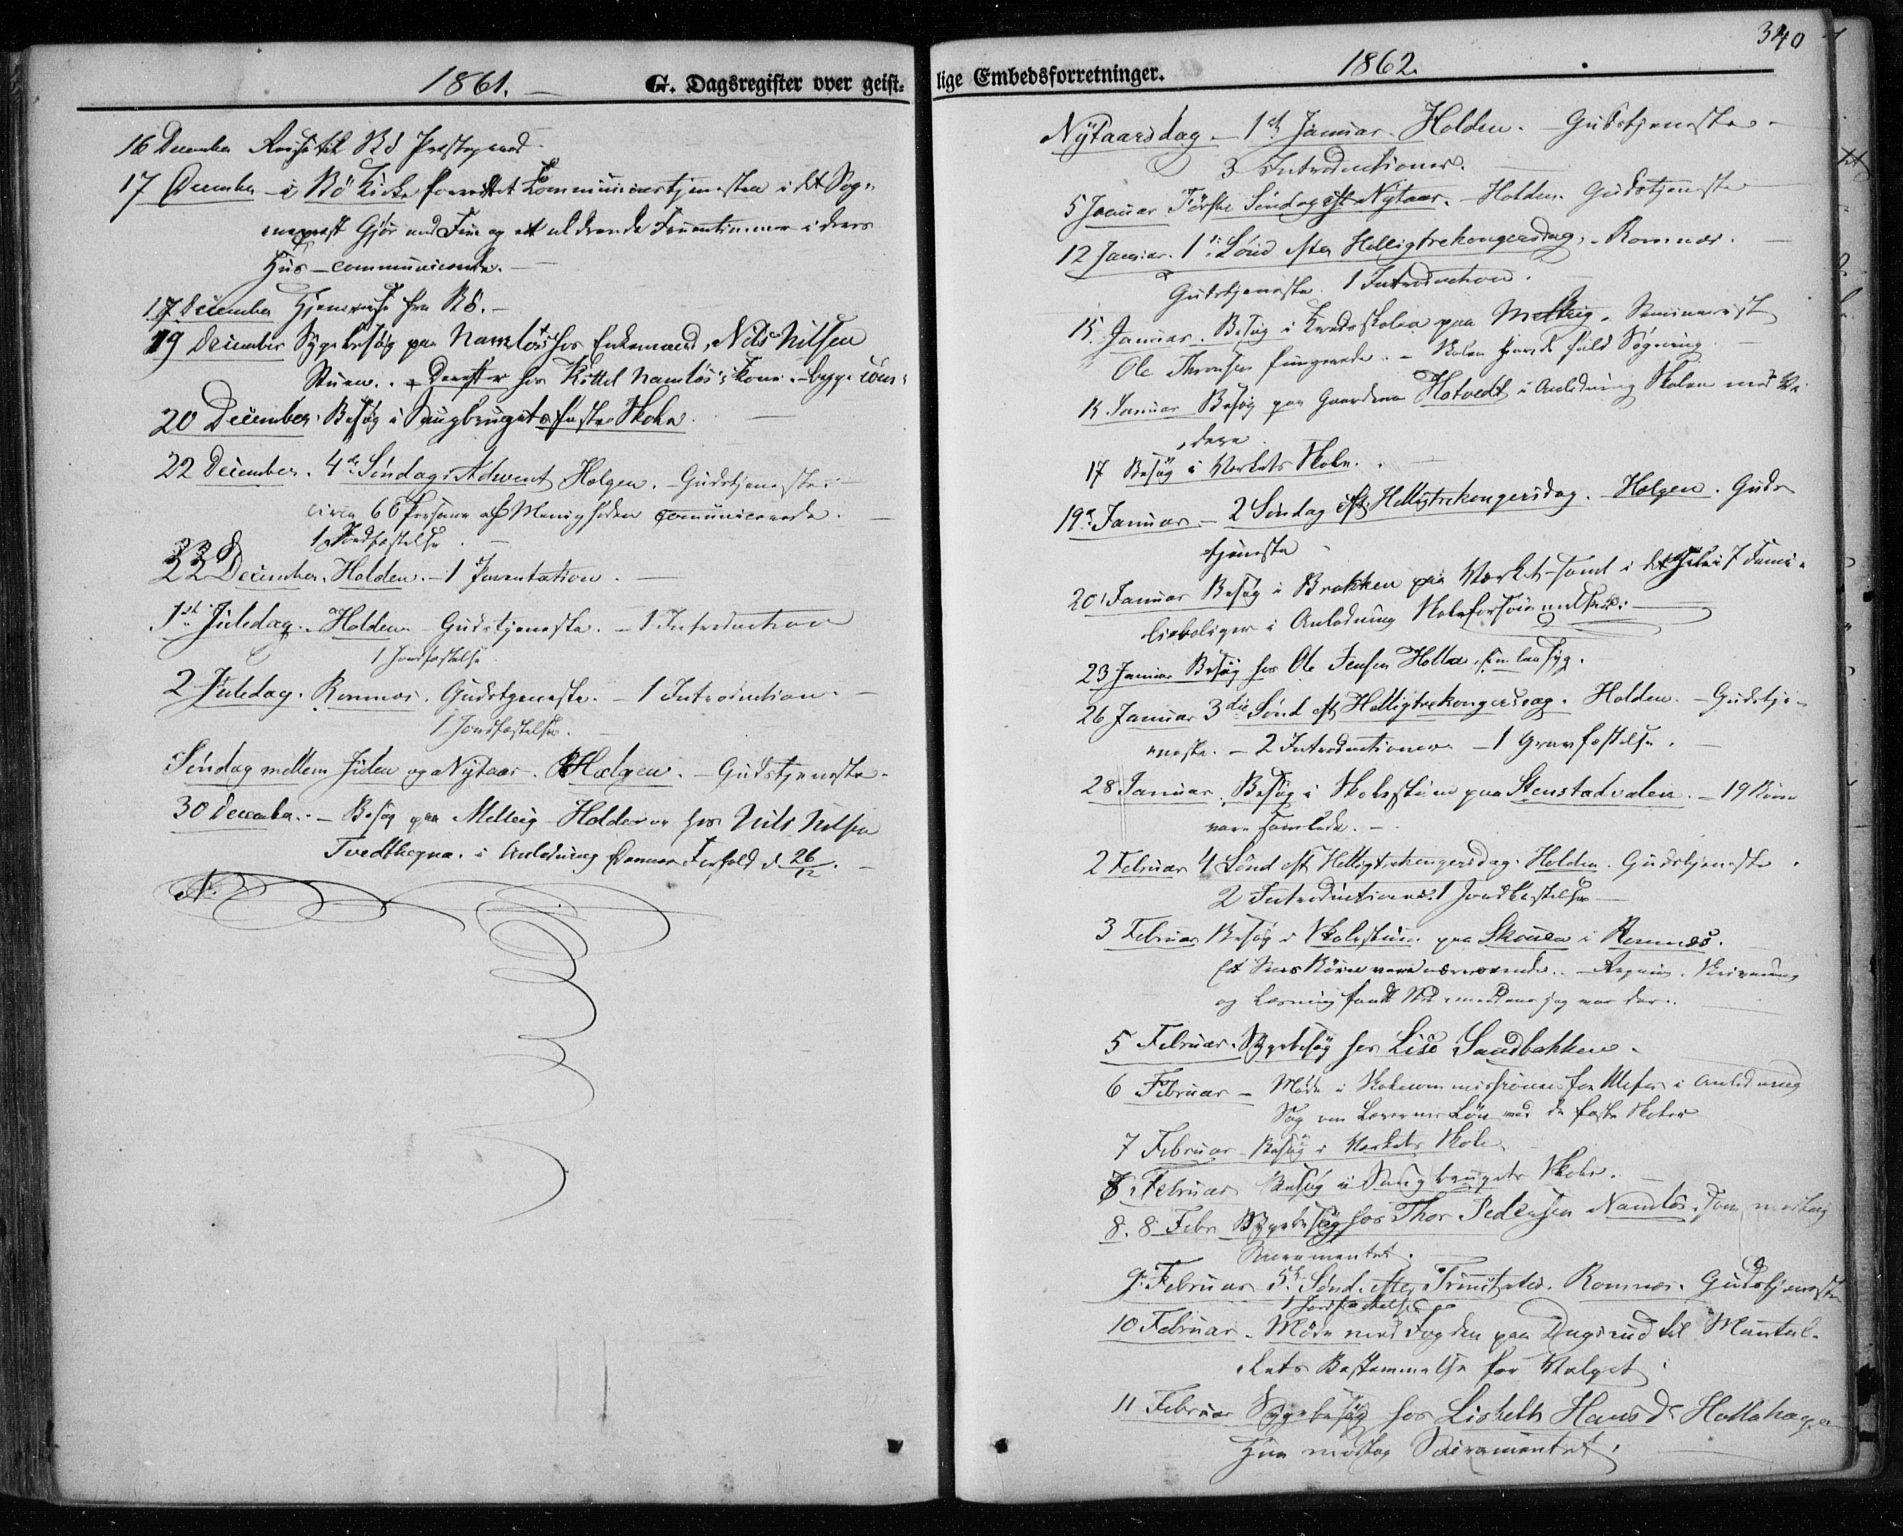 SAKO, Holla kirkebøker, F/Fa/L0006: Ministerialbok nr. 6, 1861-1869, s. 340